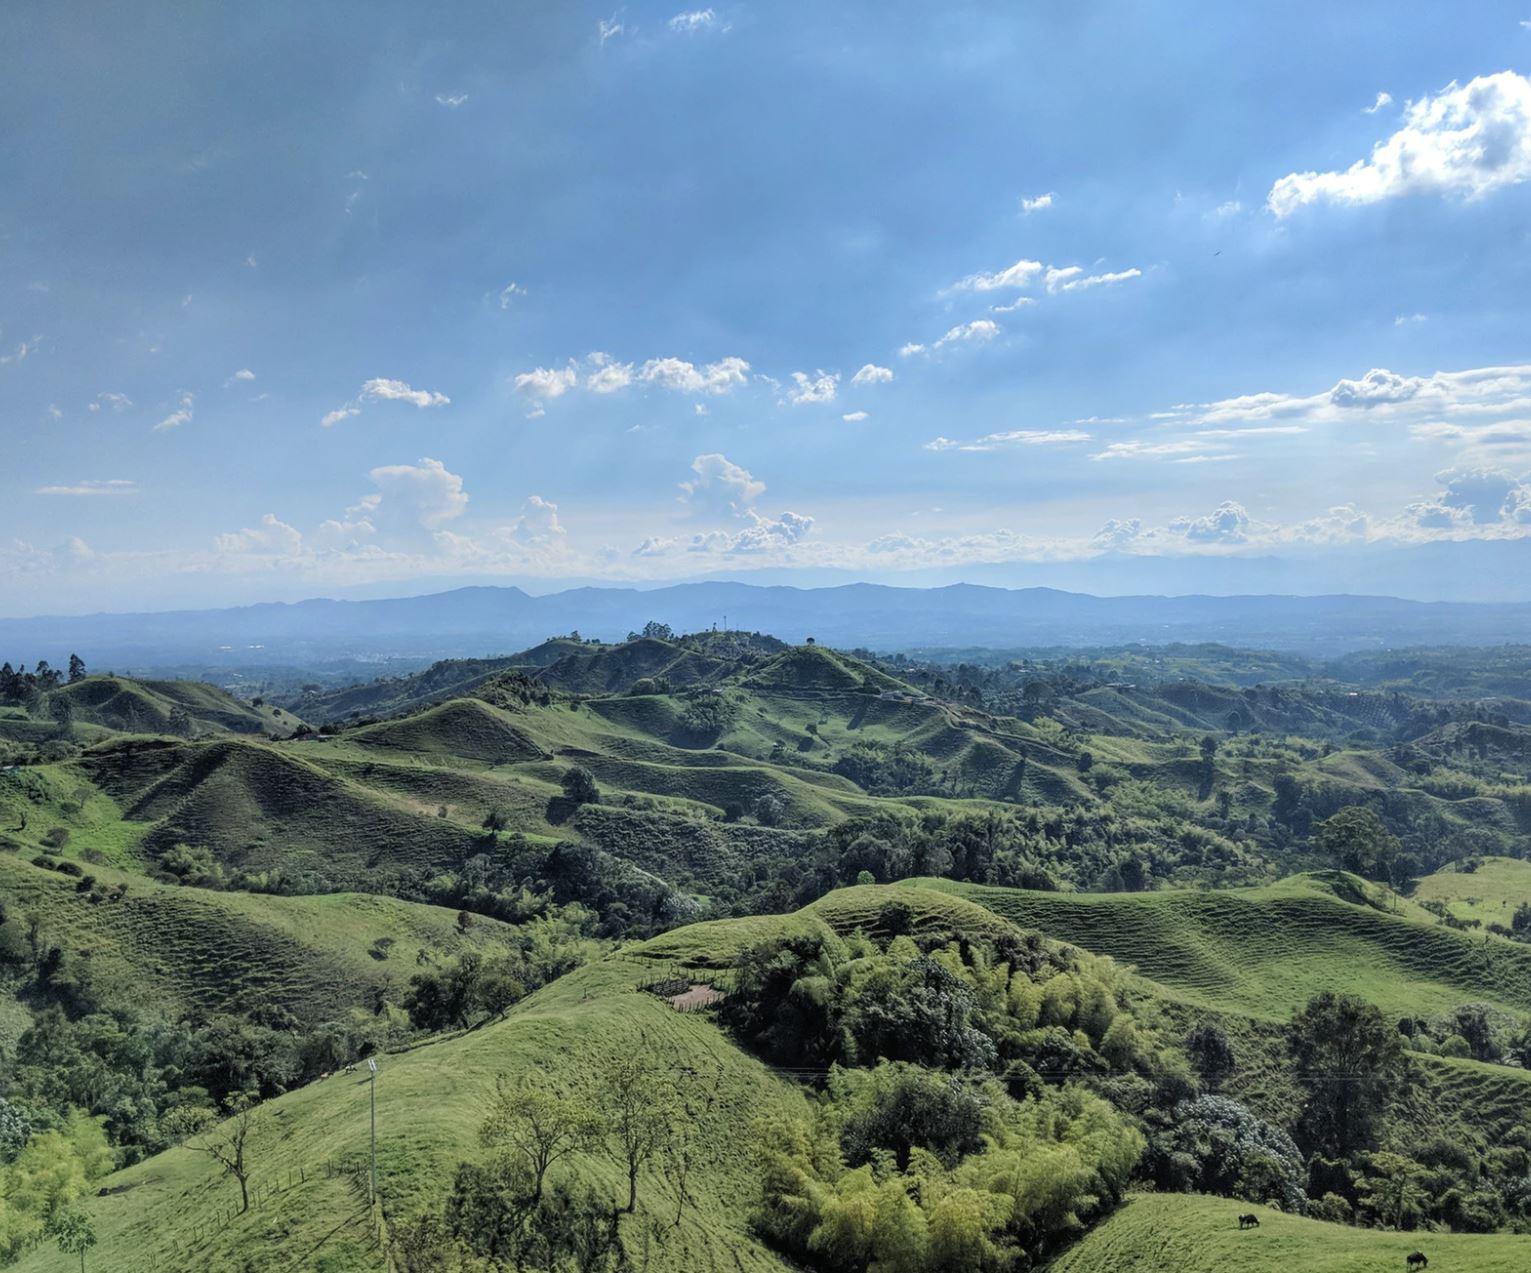 The verdant landscapes of Colombia | Michael Barón/Unsplash